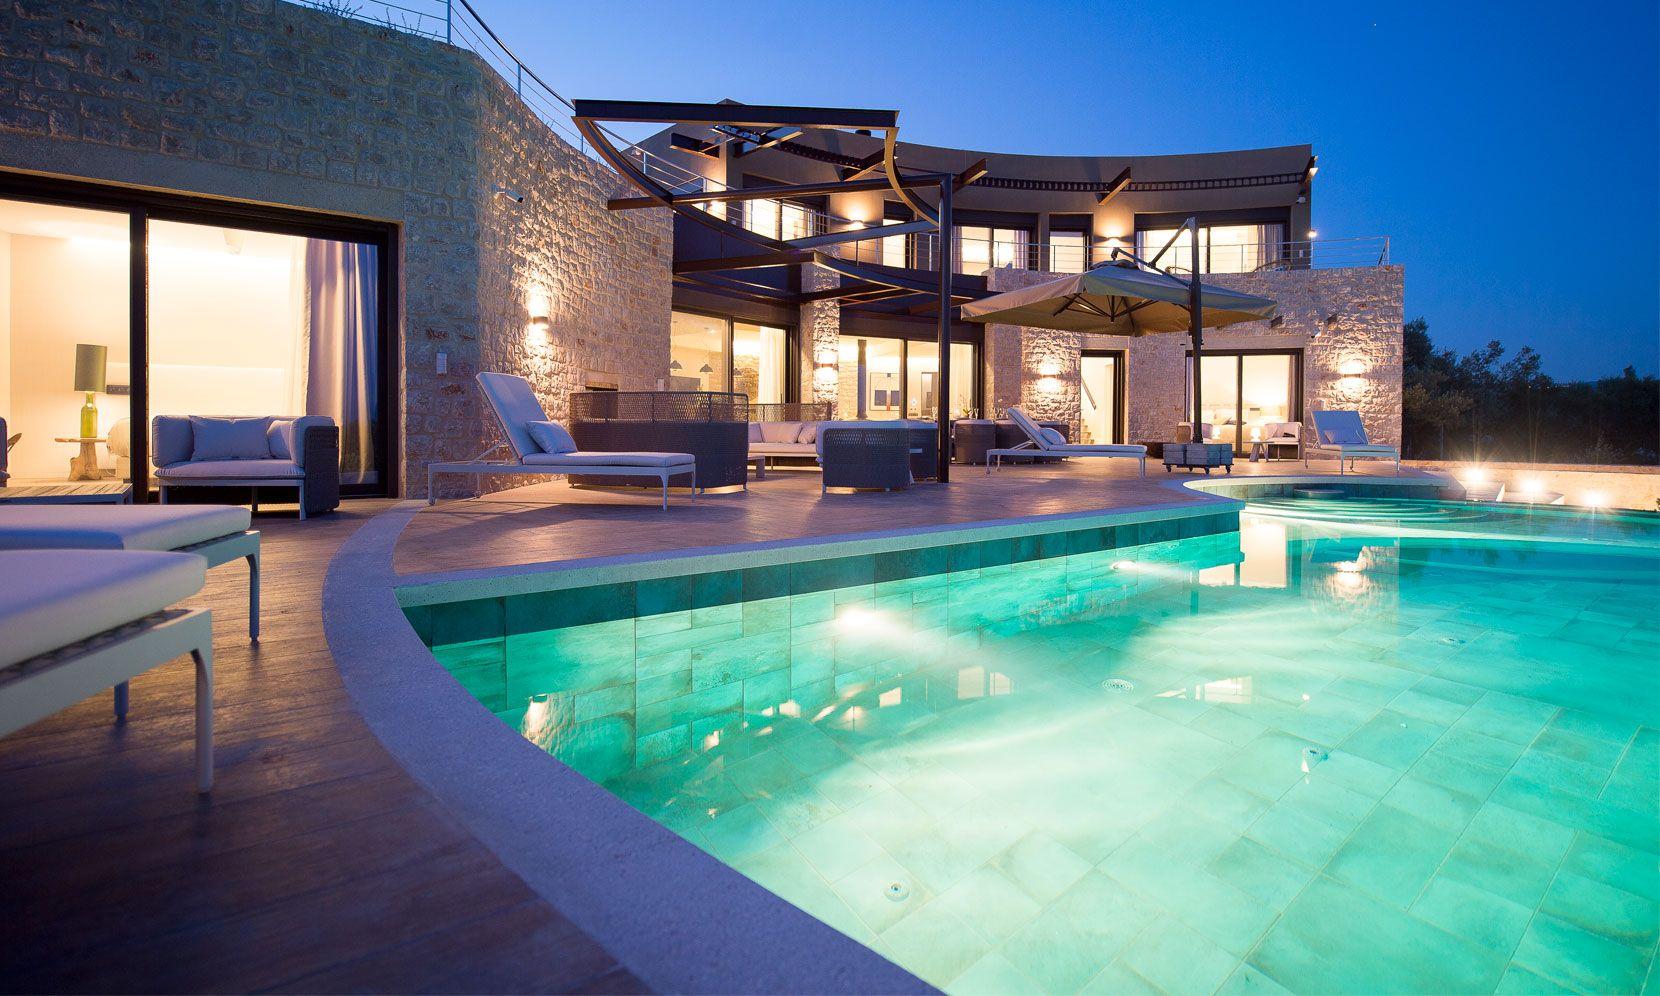 Peloponnese Villa Avani jumbotron image